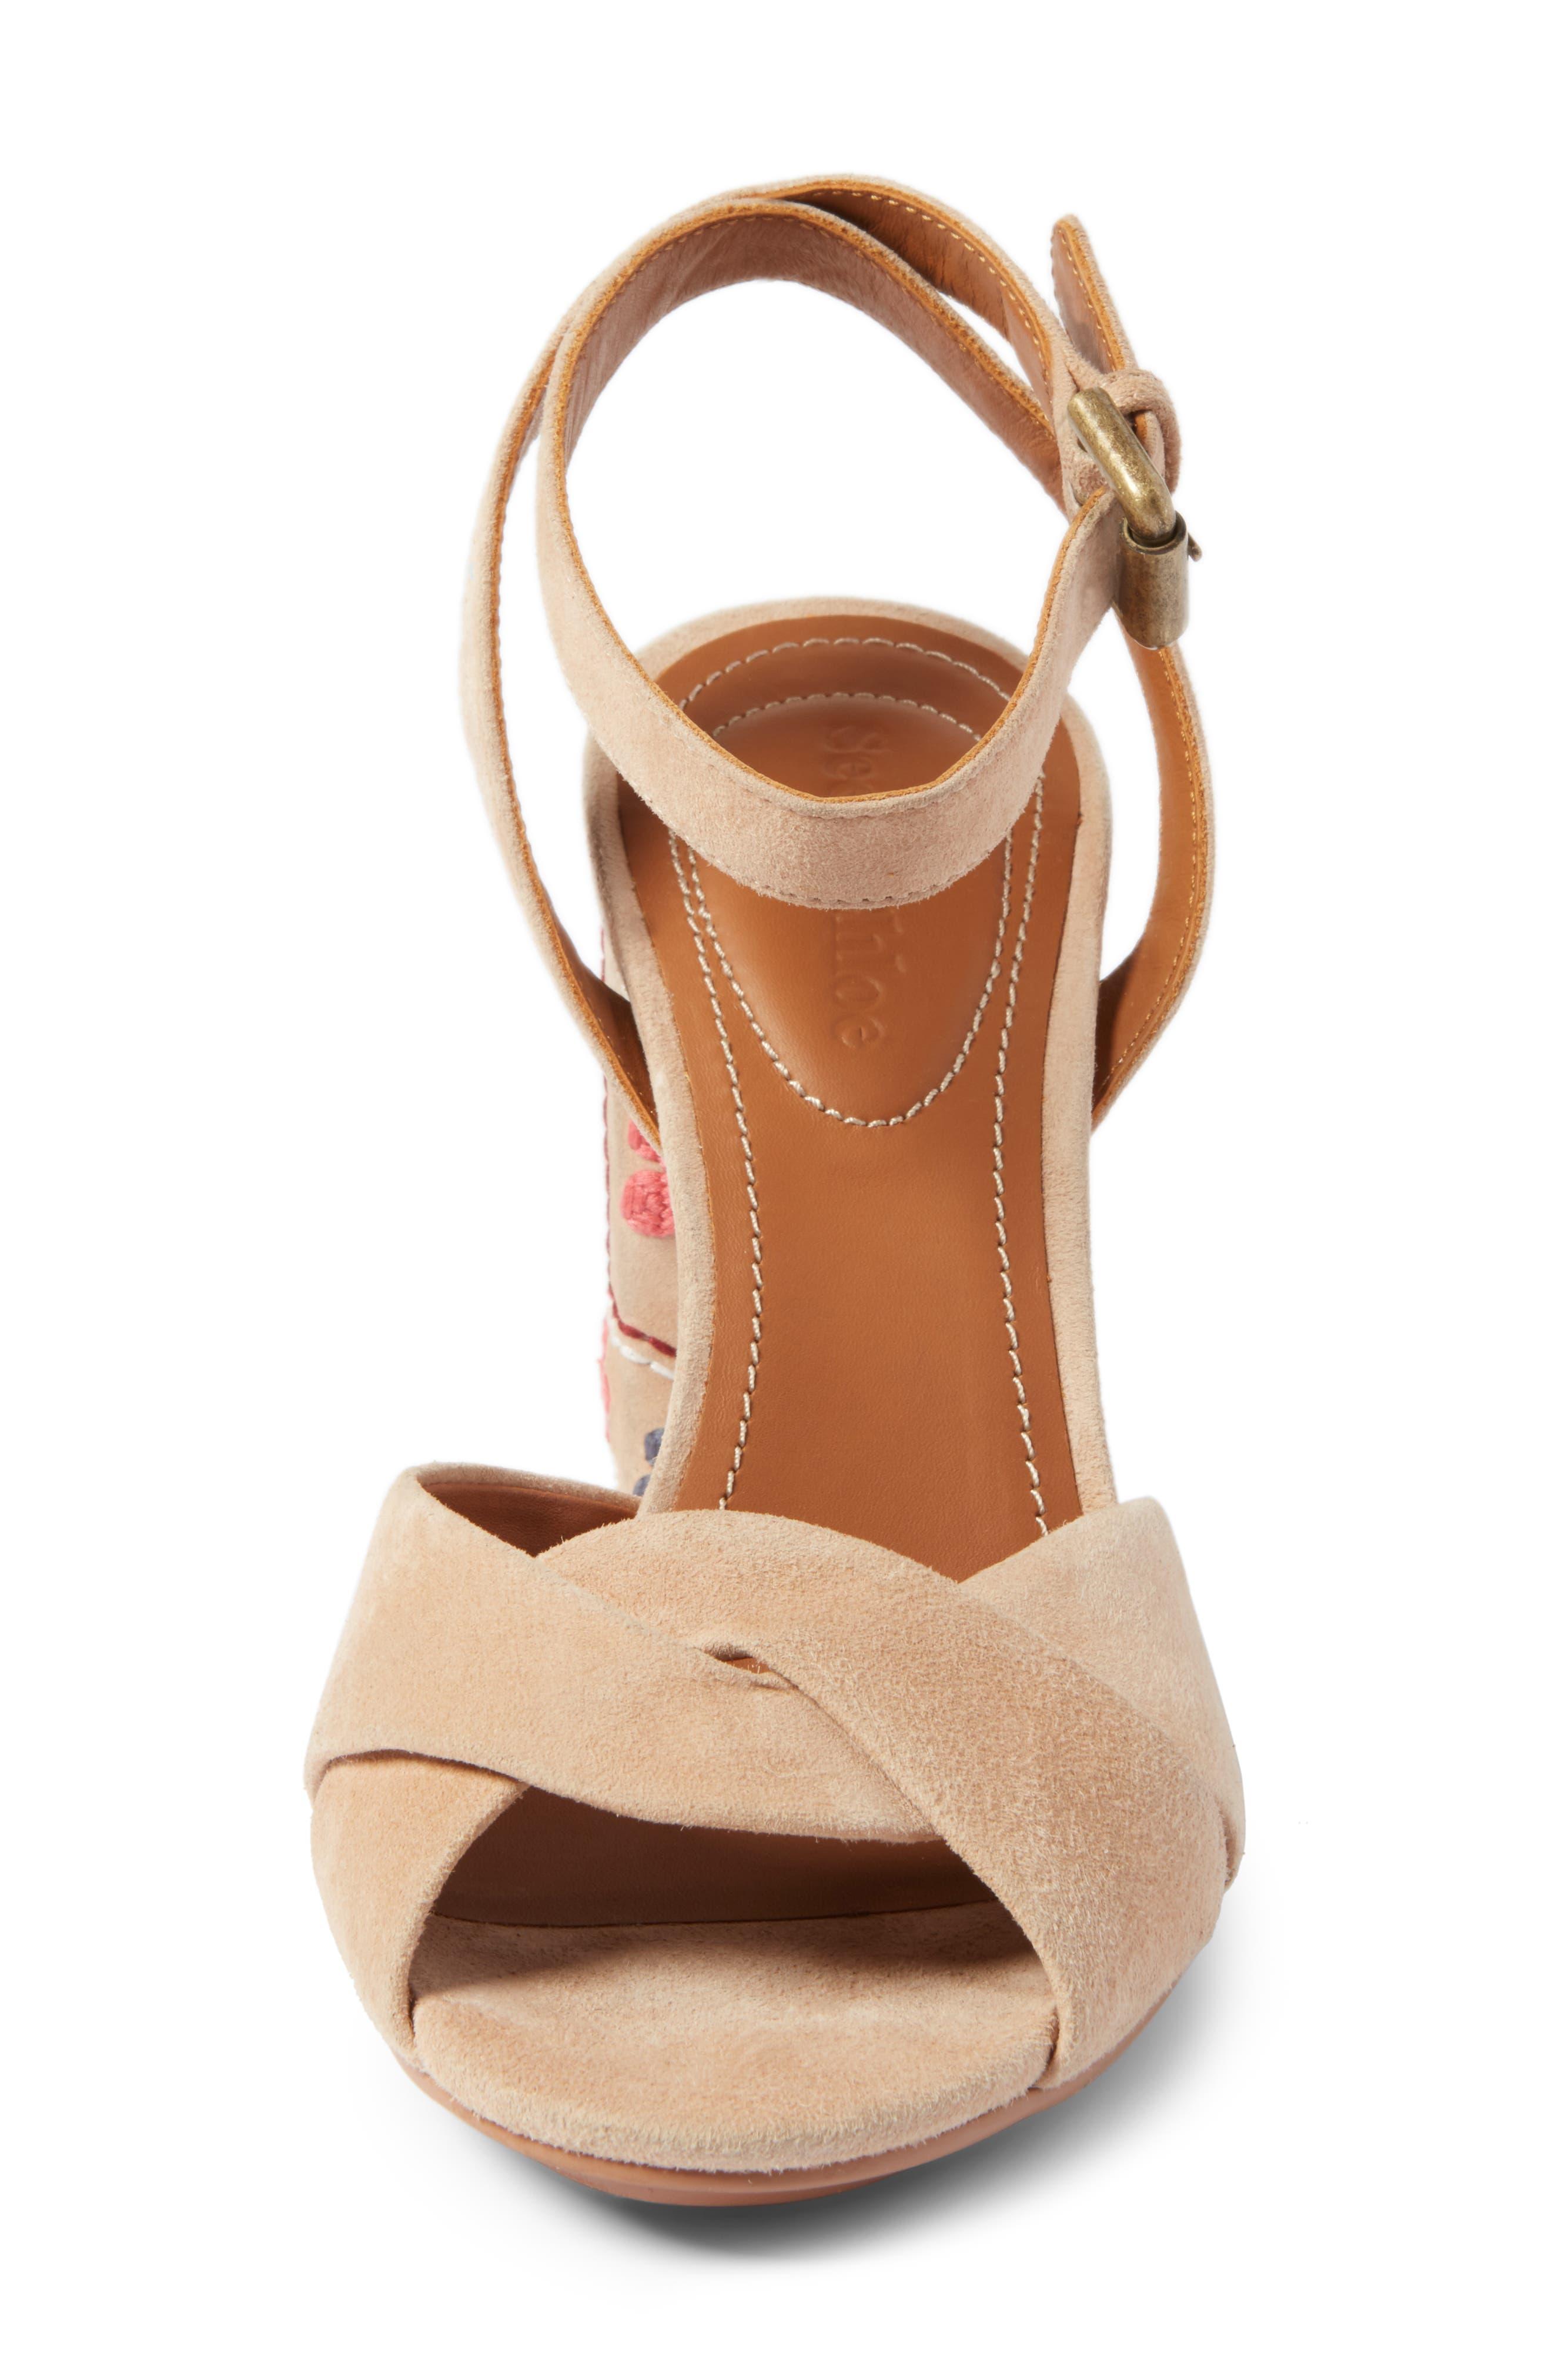 Gayla Embroidered Block Heel Sandal,                             Alternate thumbnail 4, color,                             Nude